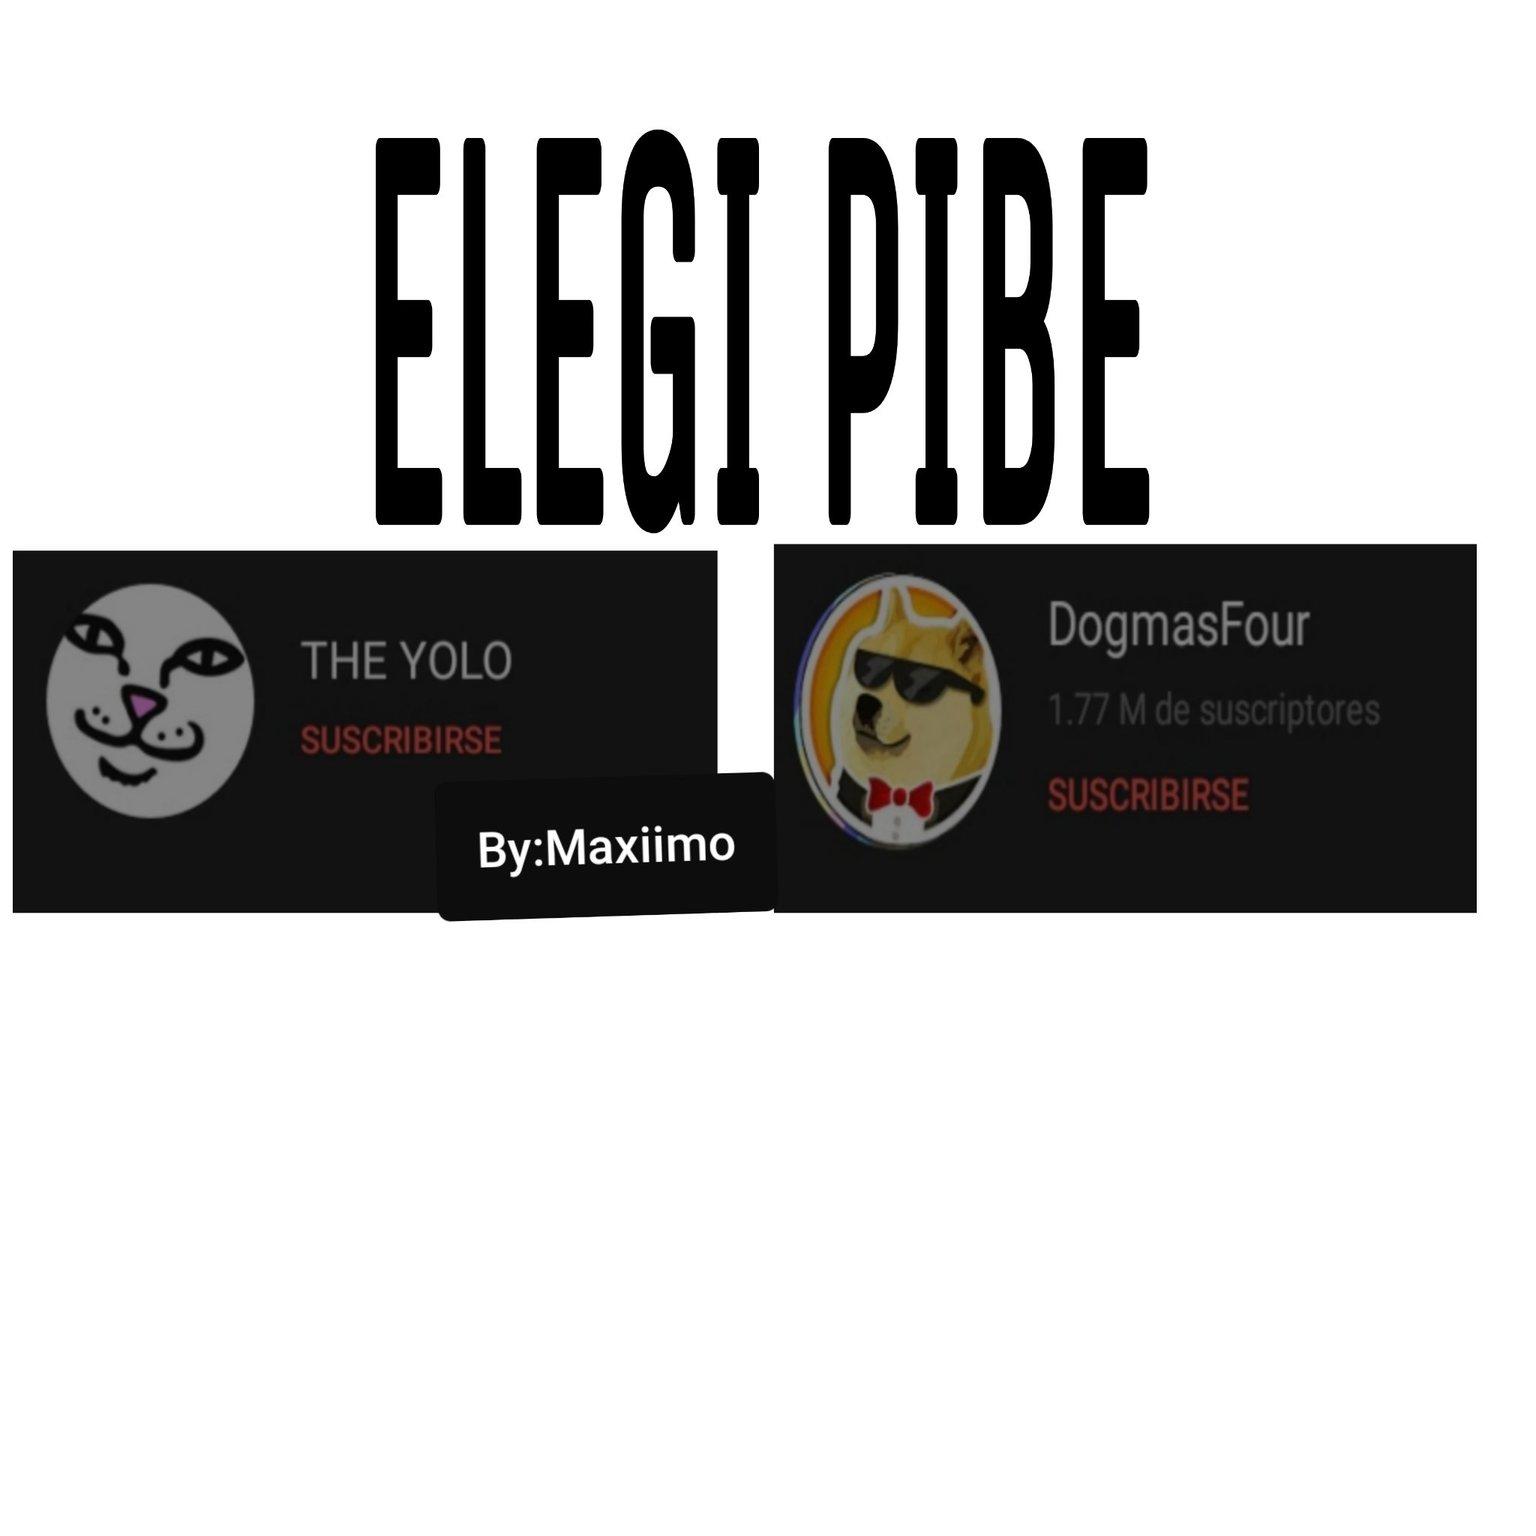 Idea 100% original - meme